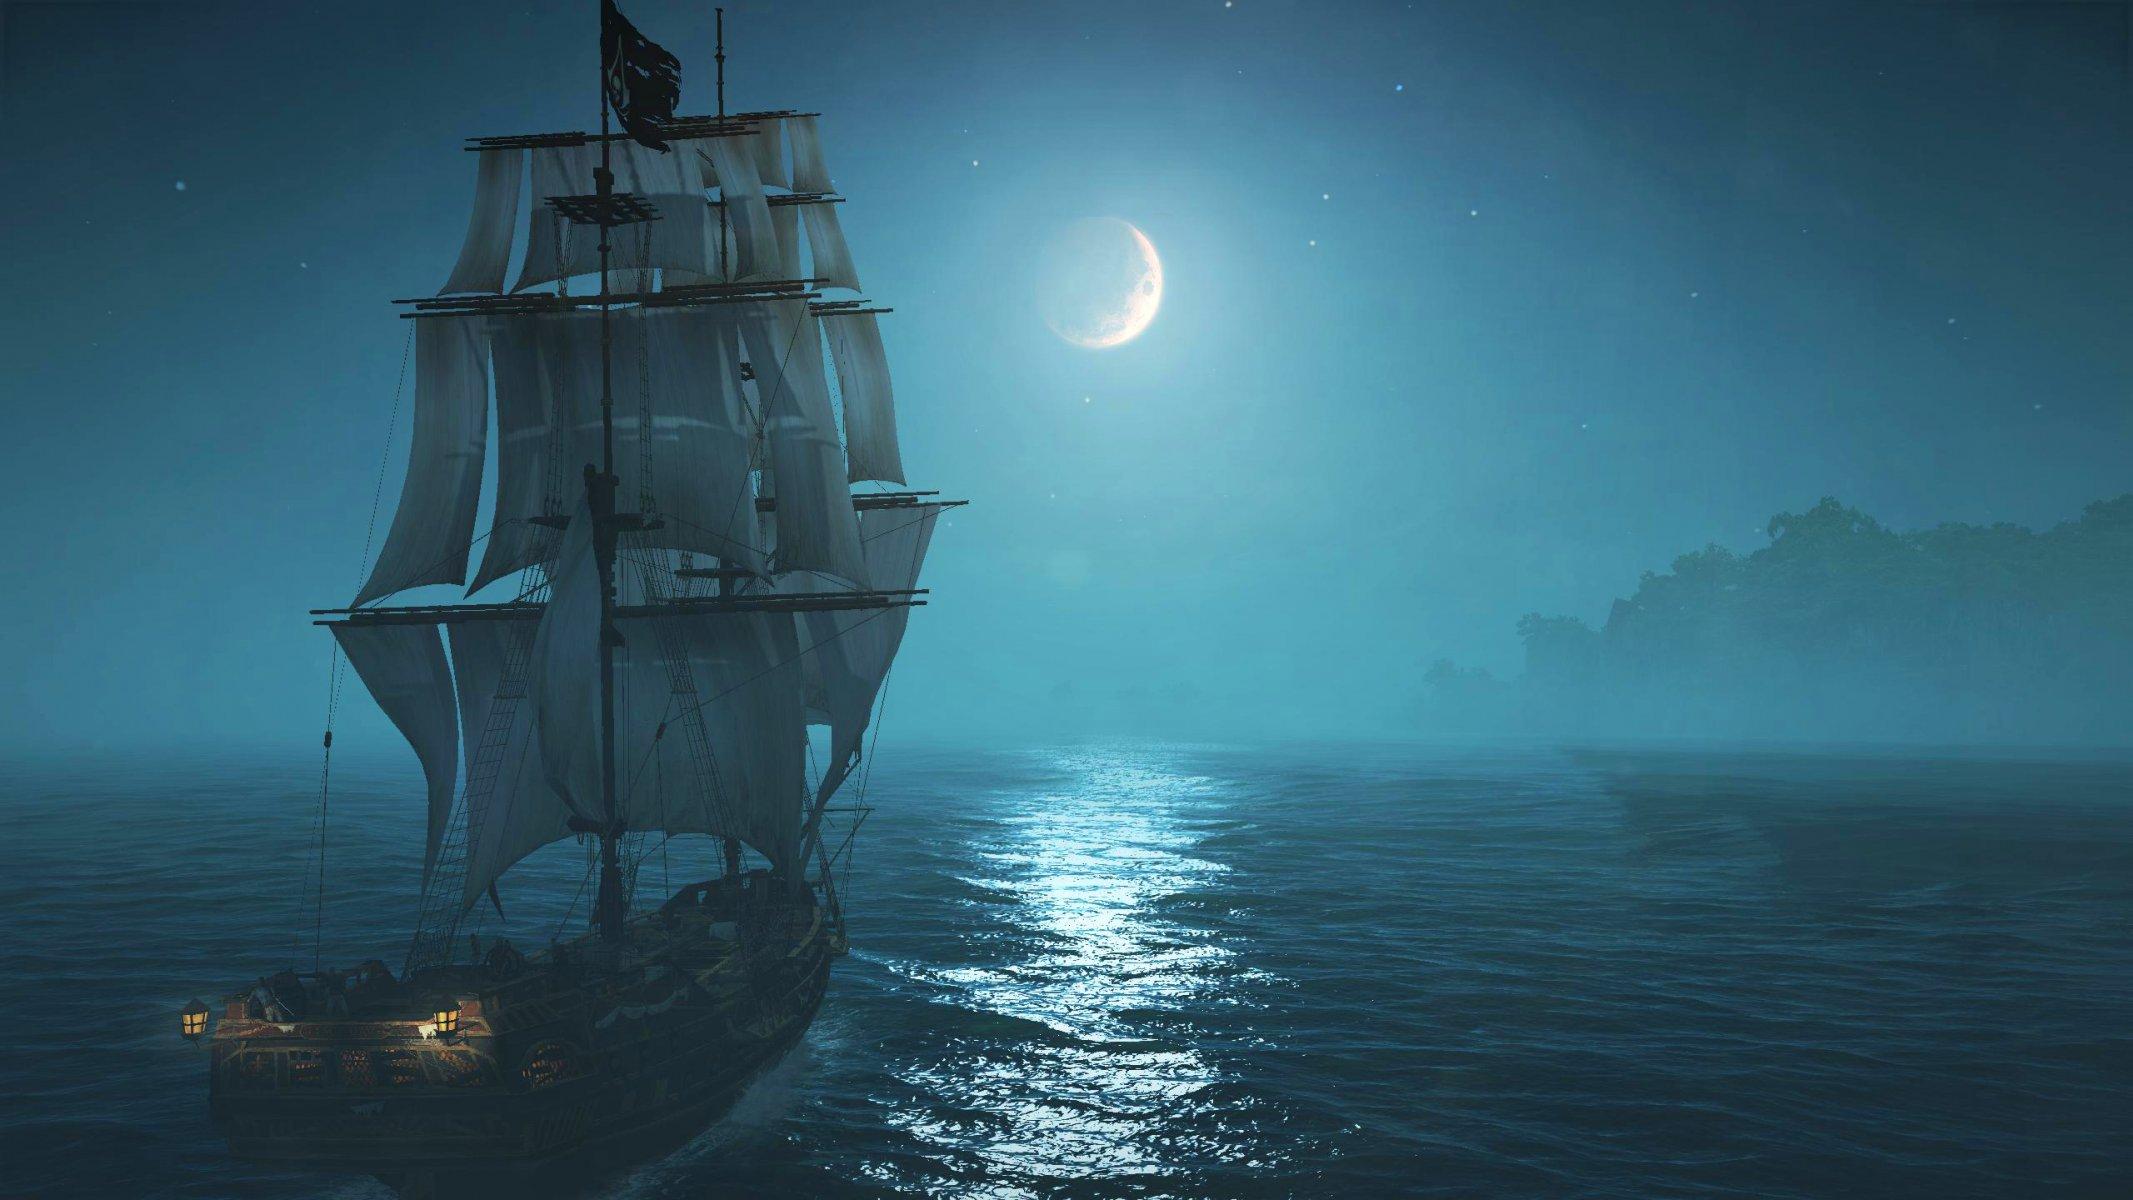 корабль паруса небо море бесплатно